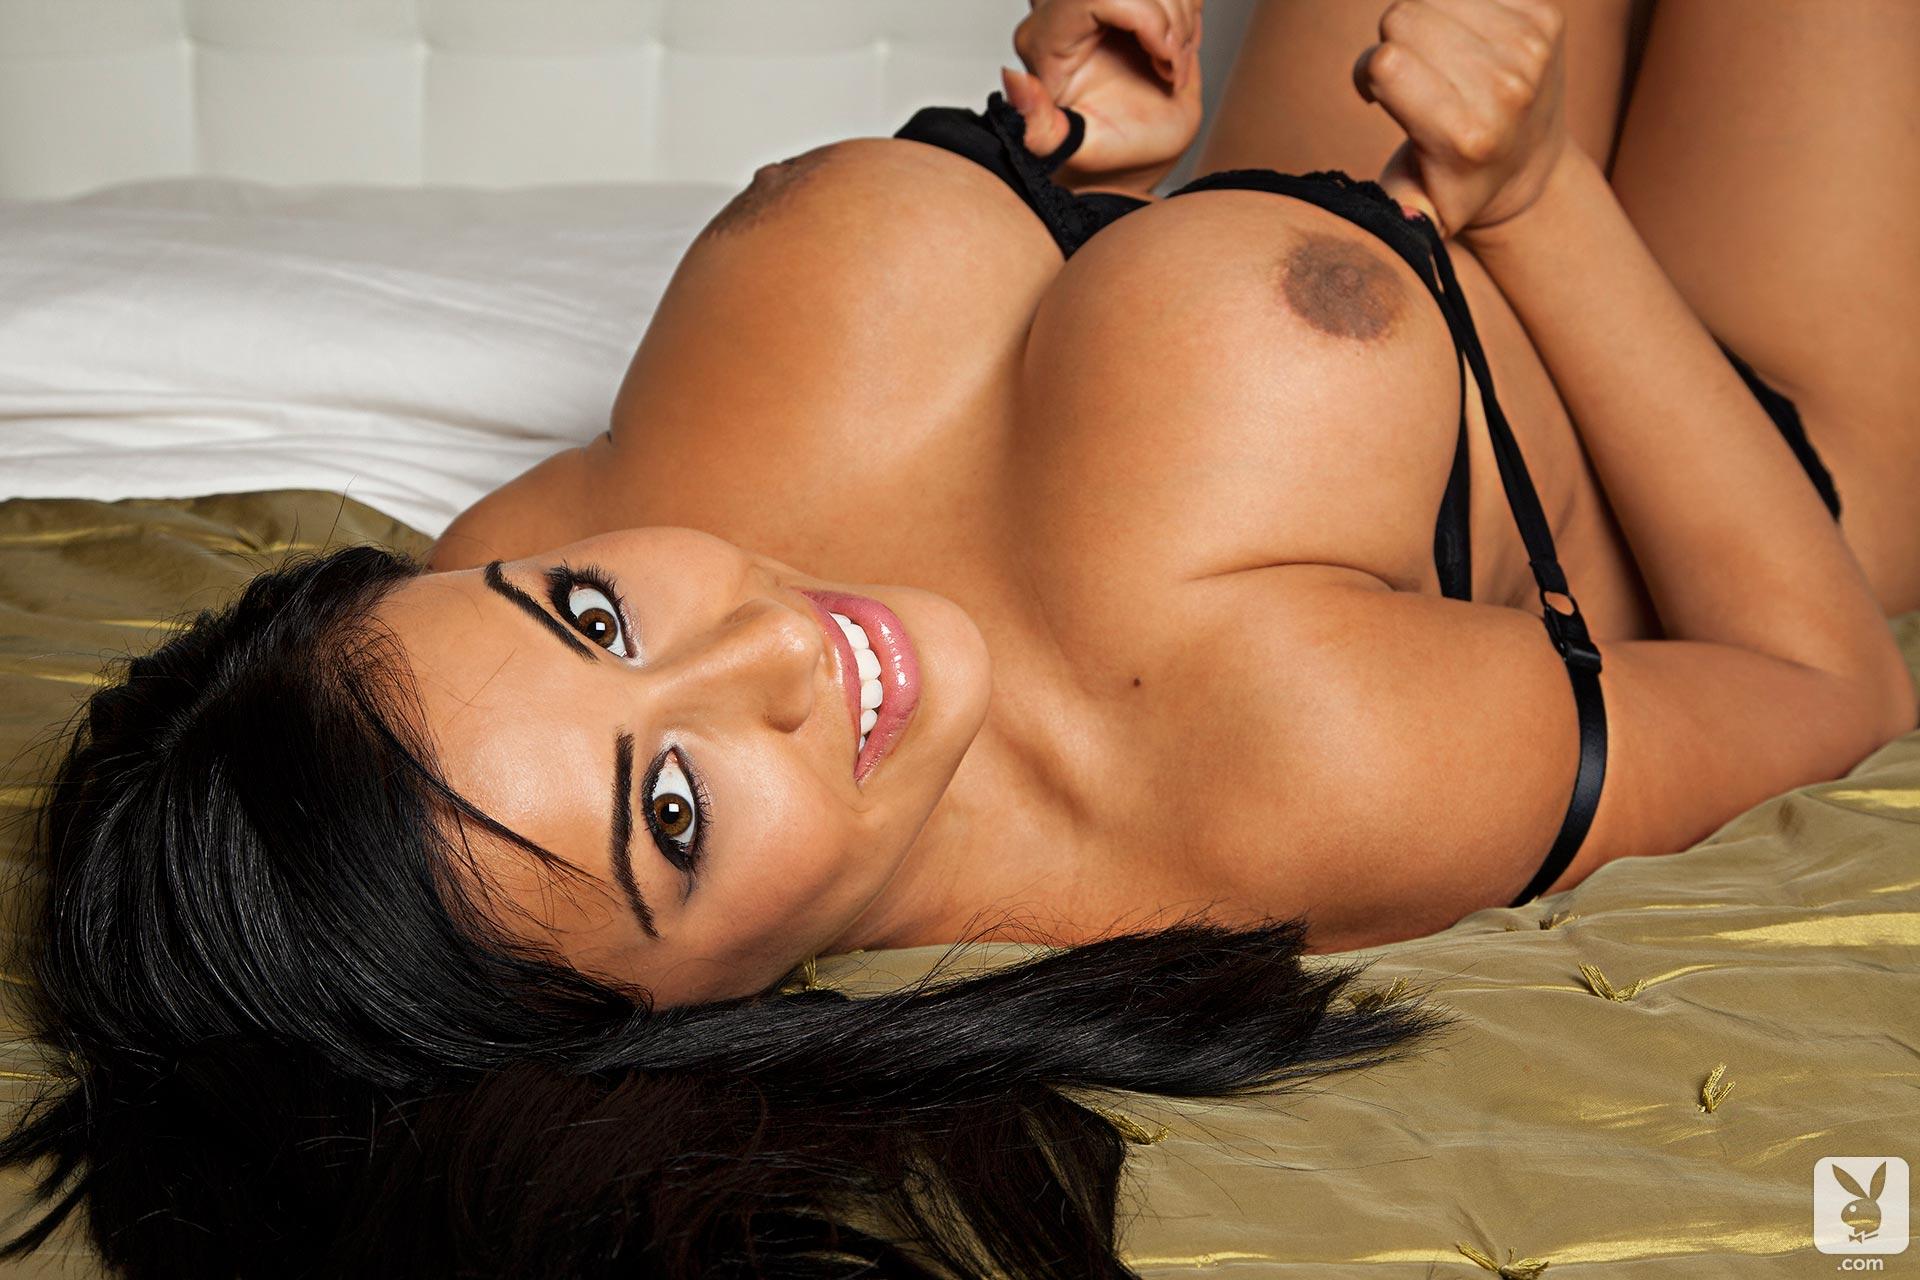 Latina sex wallpapers hardcore scenes